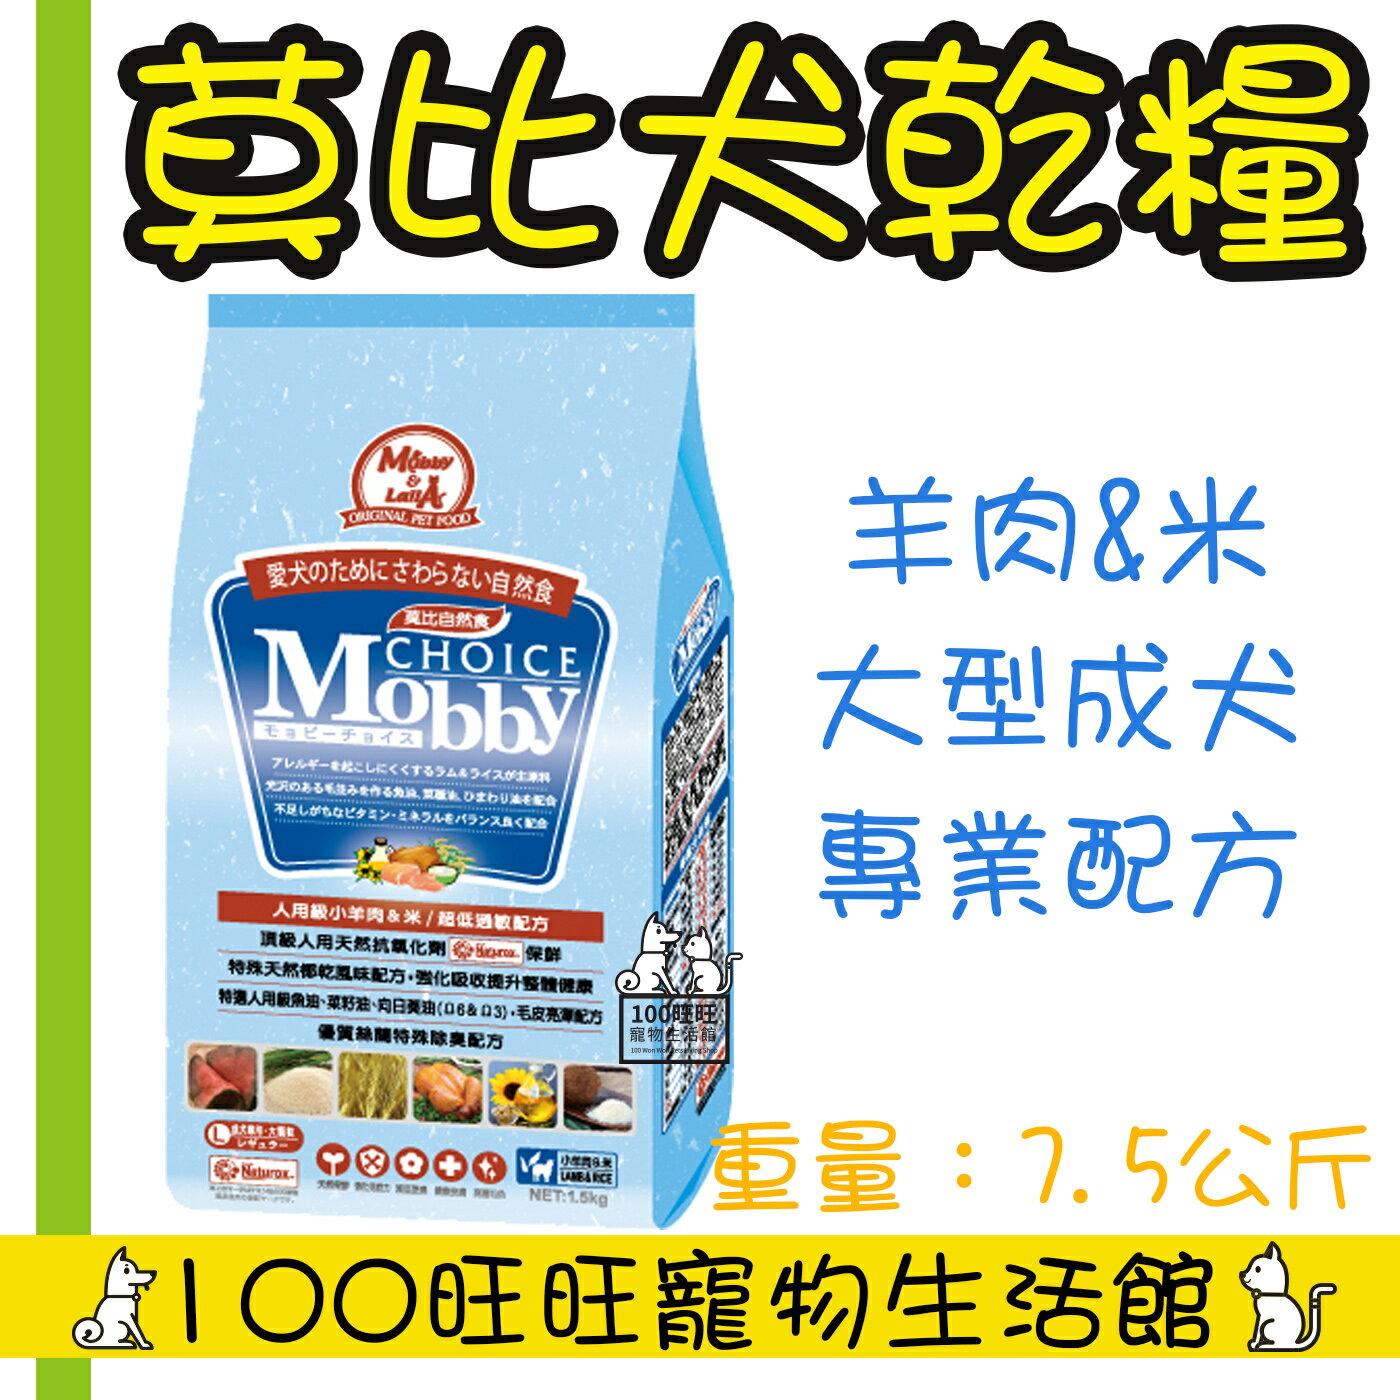 Mobby 莫比 羊肉米 大型成犬 7.5kg 0